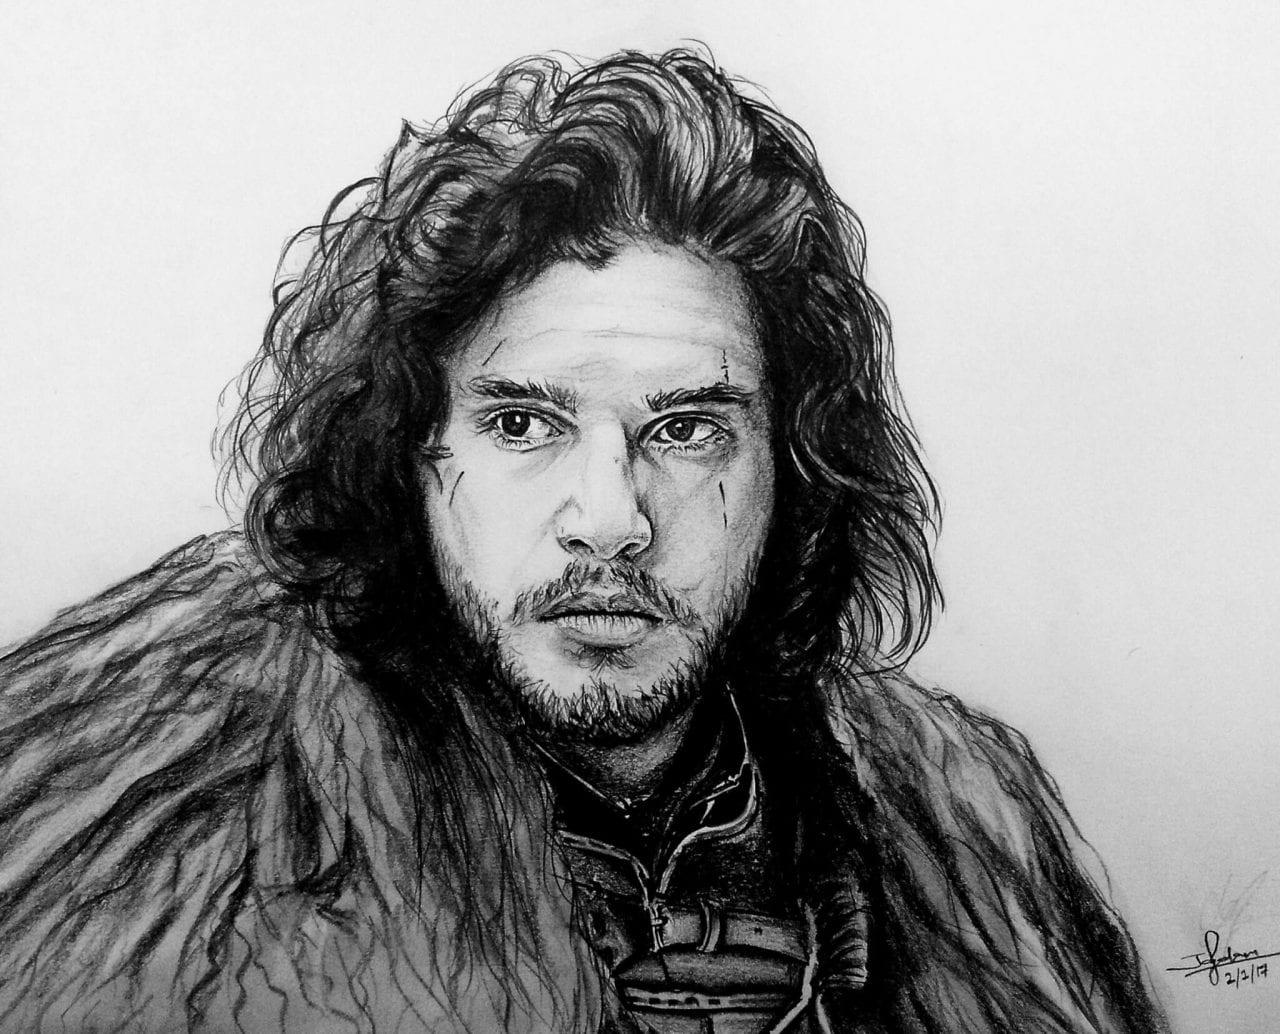 Jon snow pencil portrait by jay